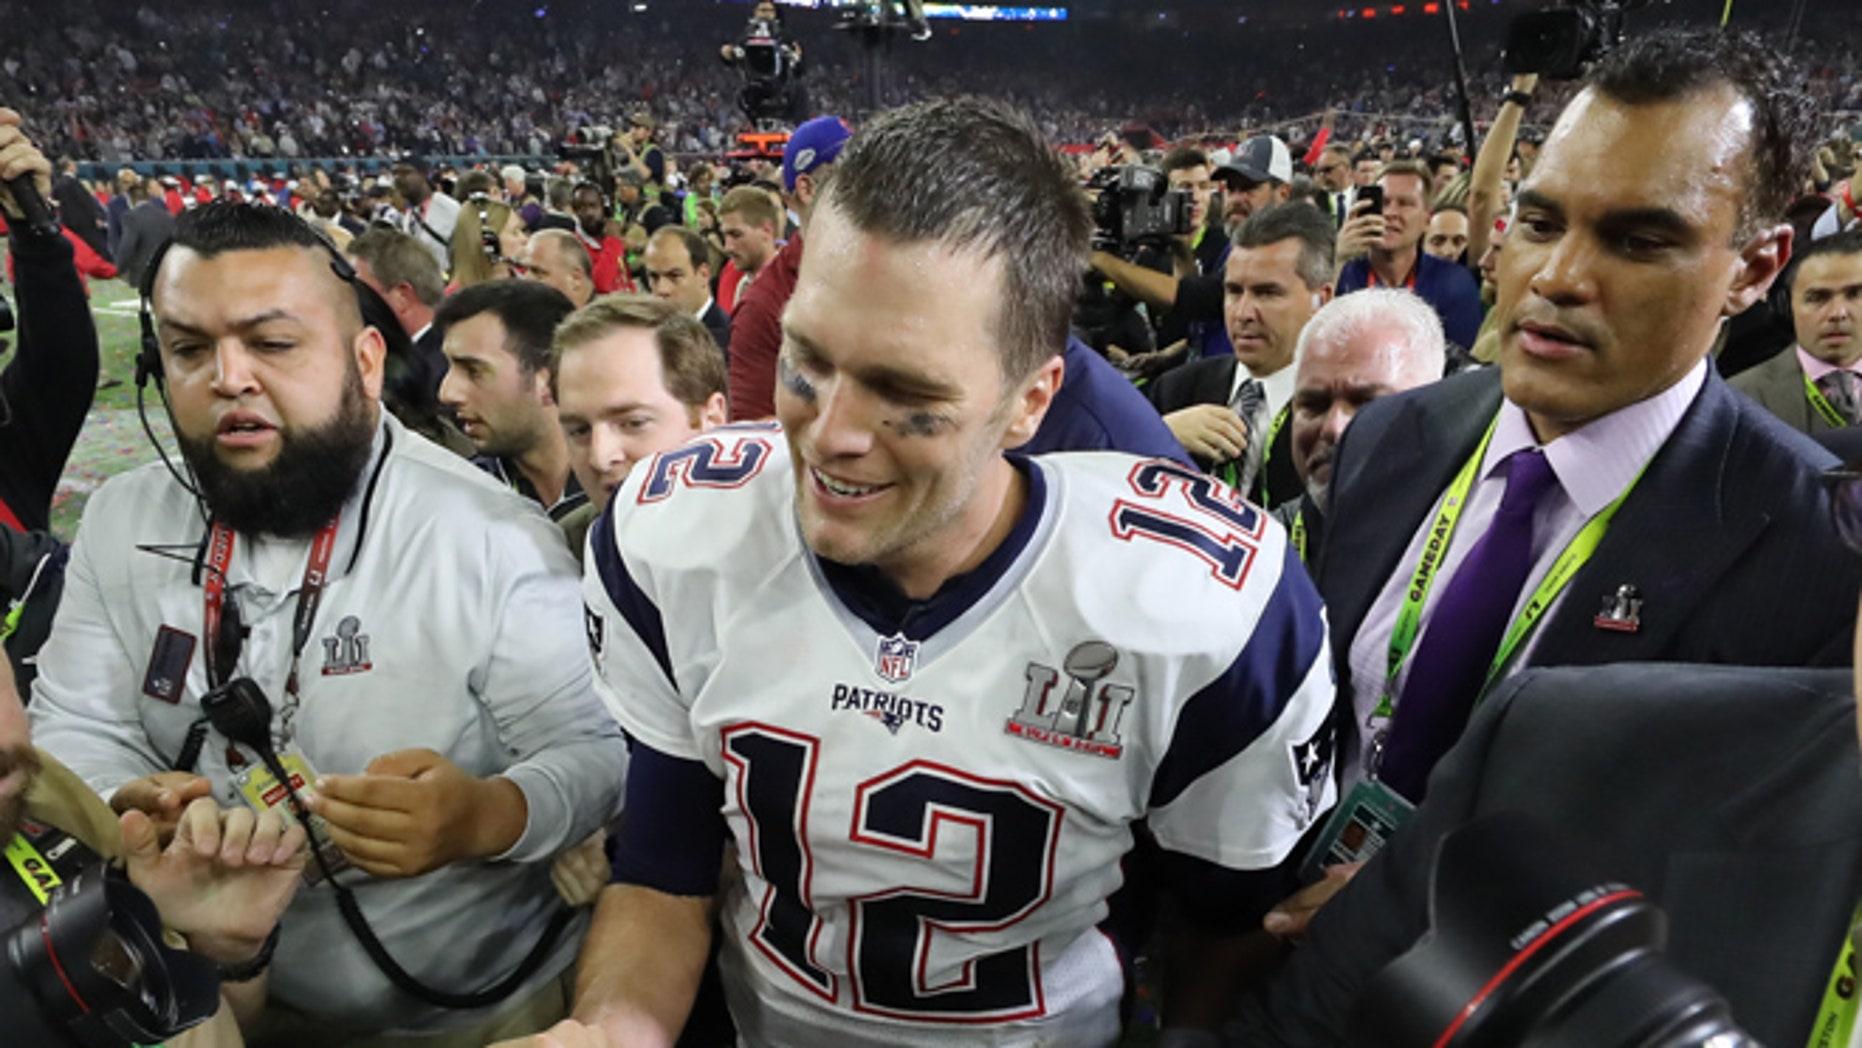 New England Patriots' quarterback Tom Brady smiles after his team defeated the Atlanta Falcons at Super Bowl LI in Houston, Texas, U.S., February 5, 2017. REUTERS/Adrees Latif - RTX2ZRK0